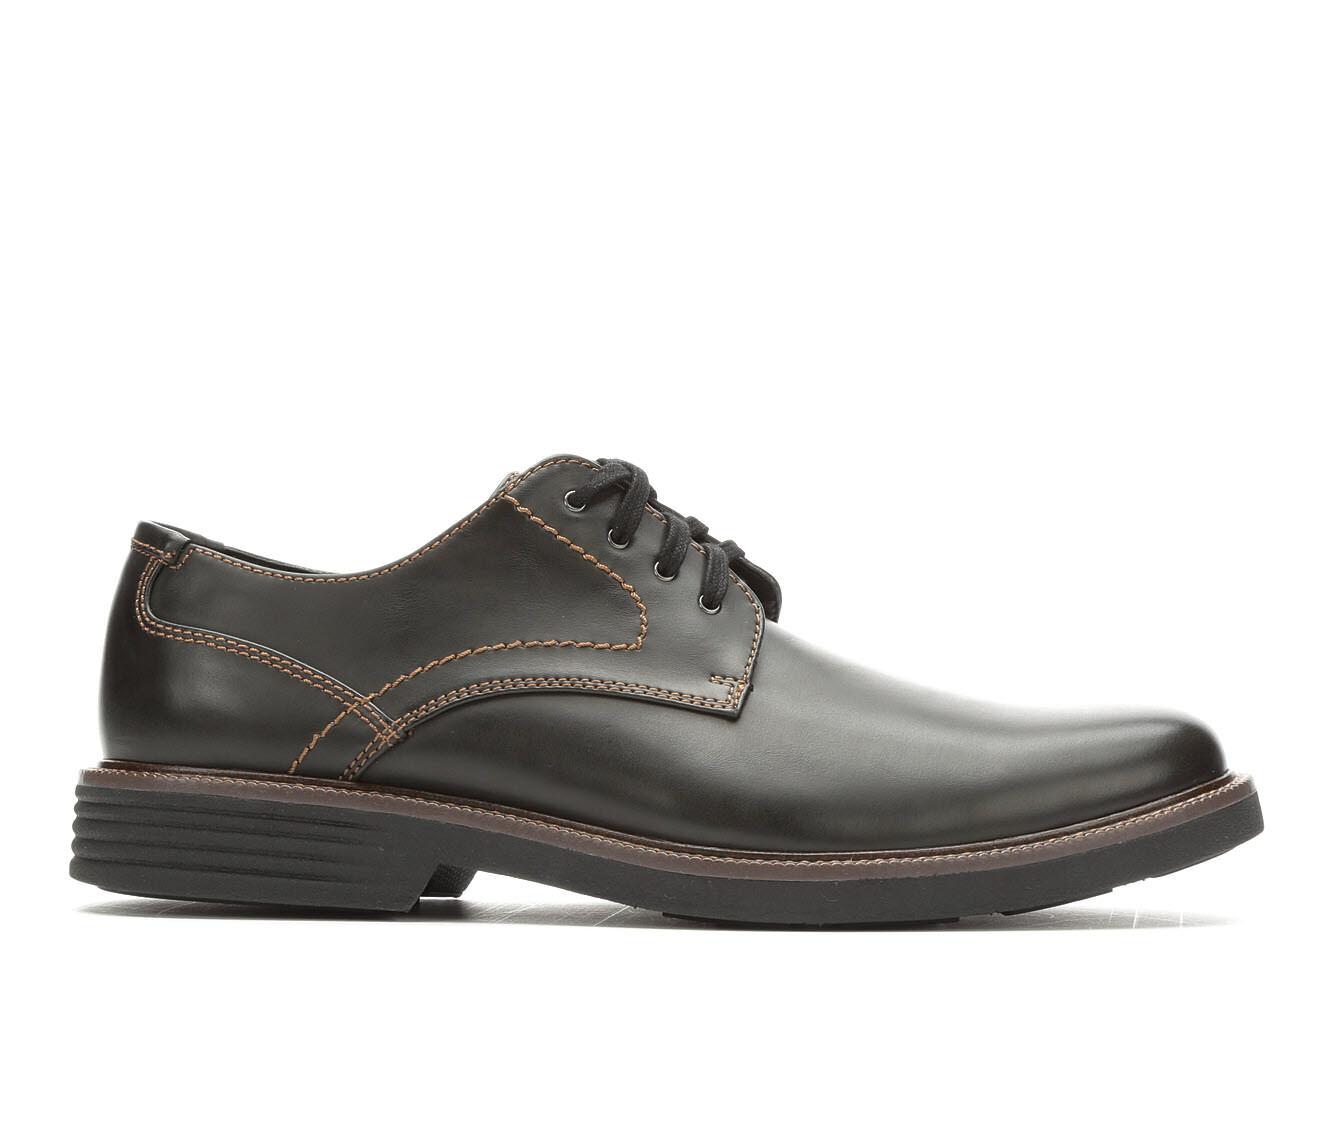 Men's Dockers Lamont Dress Shoes Black